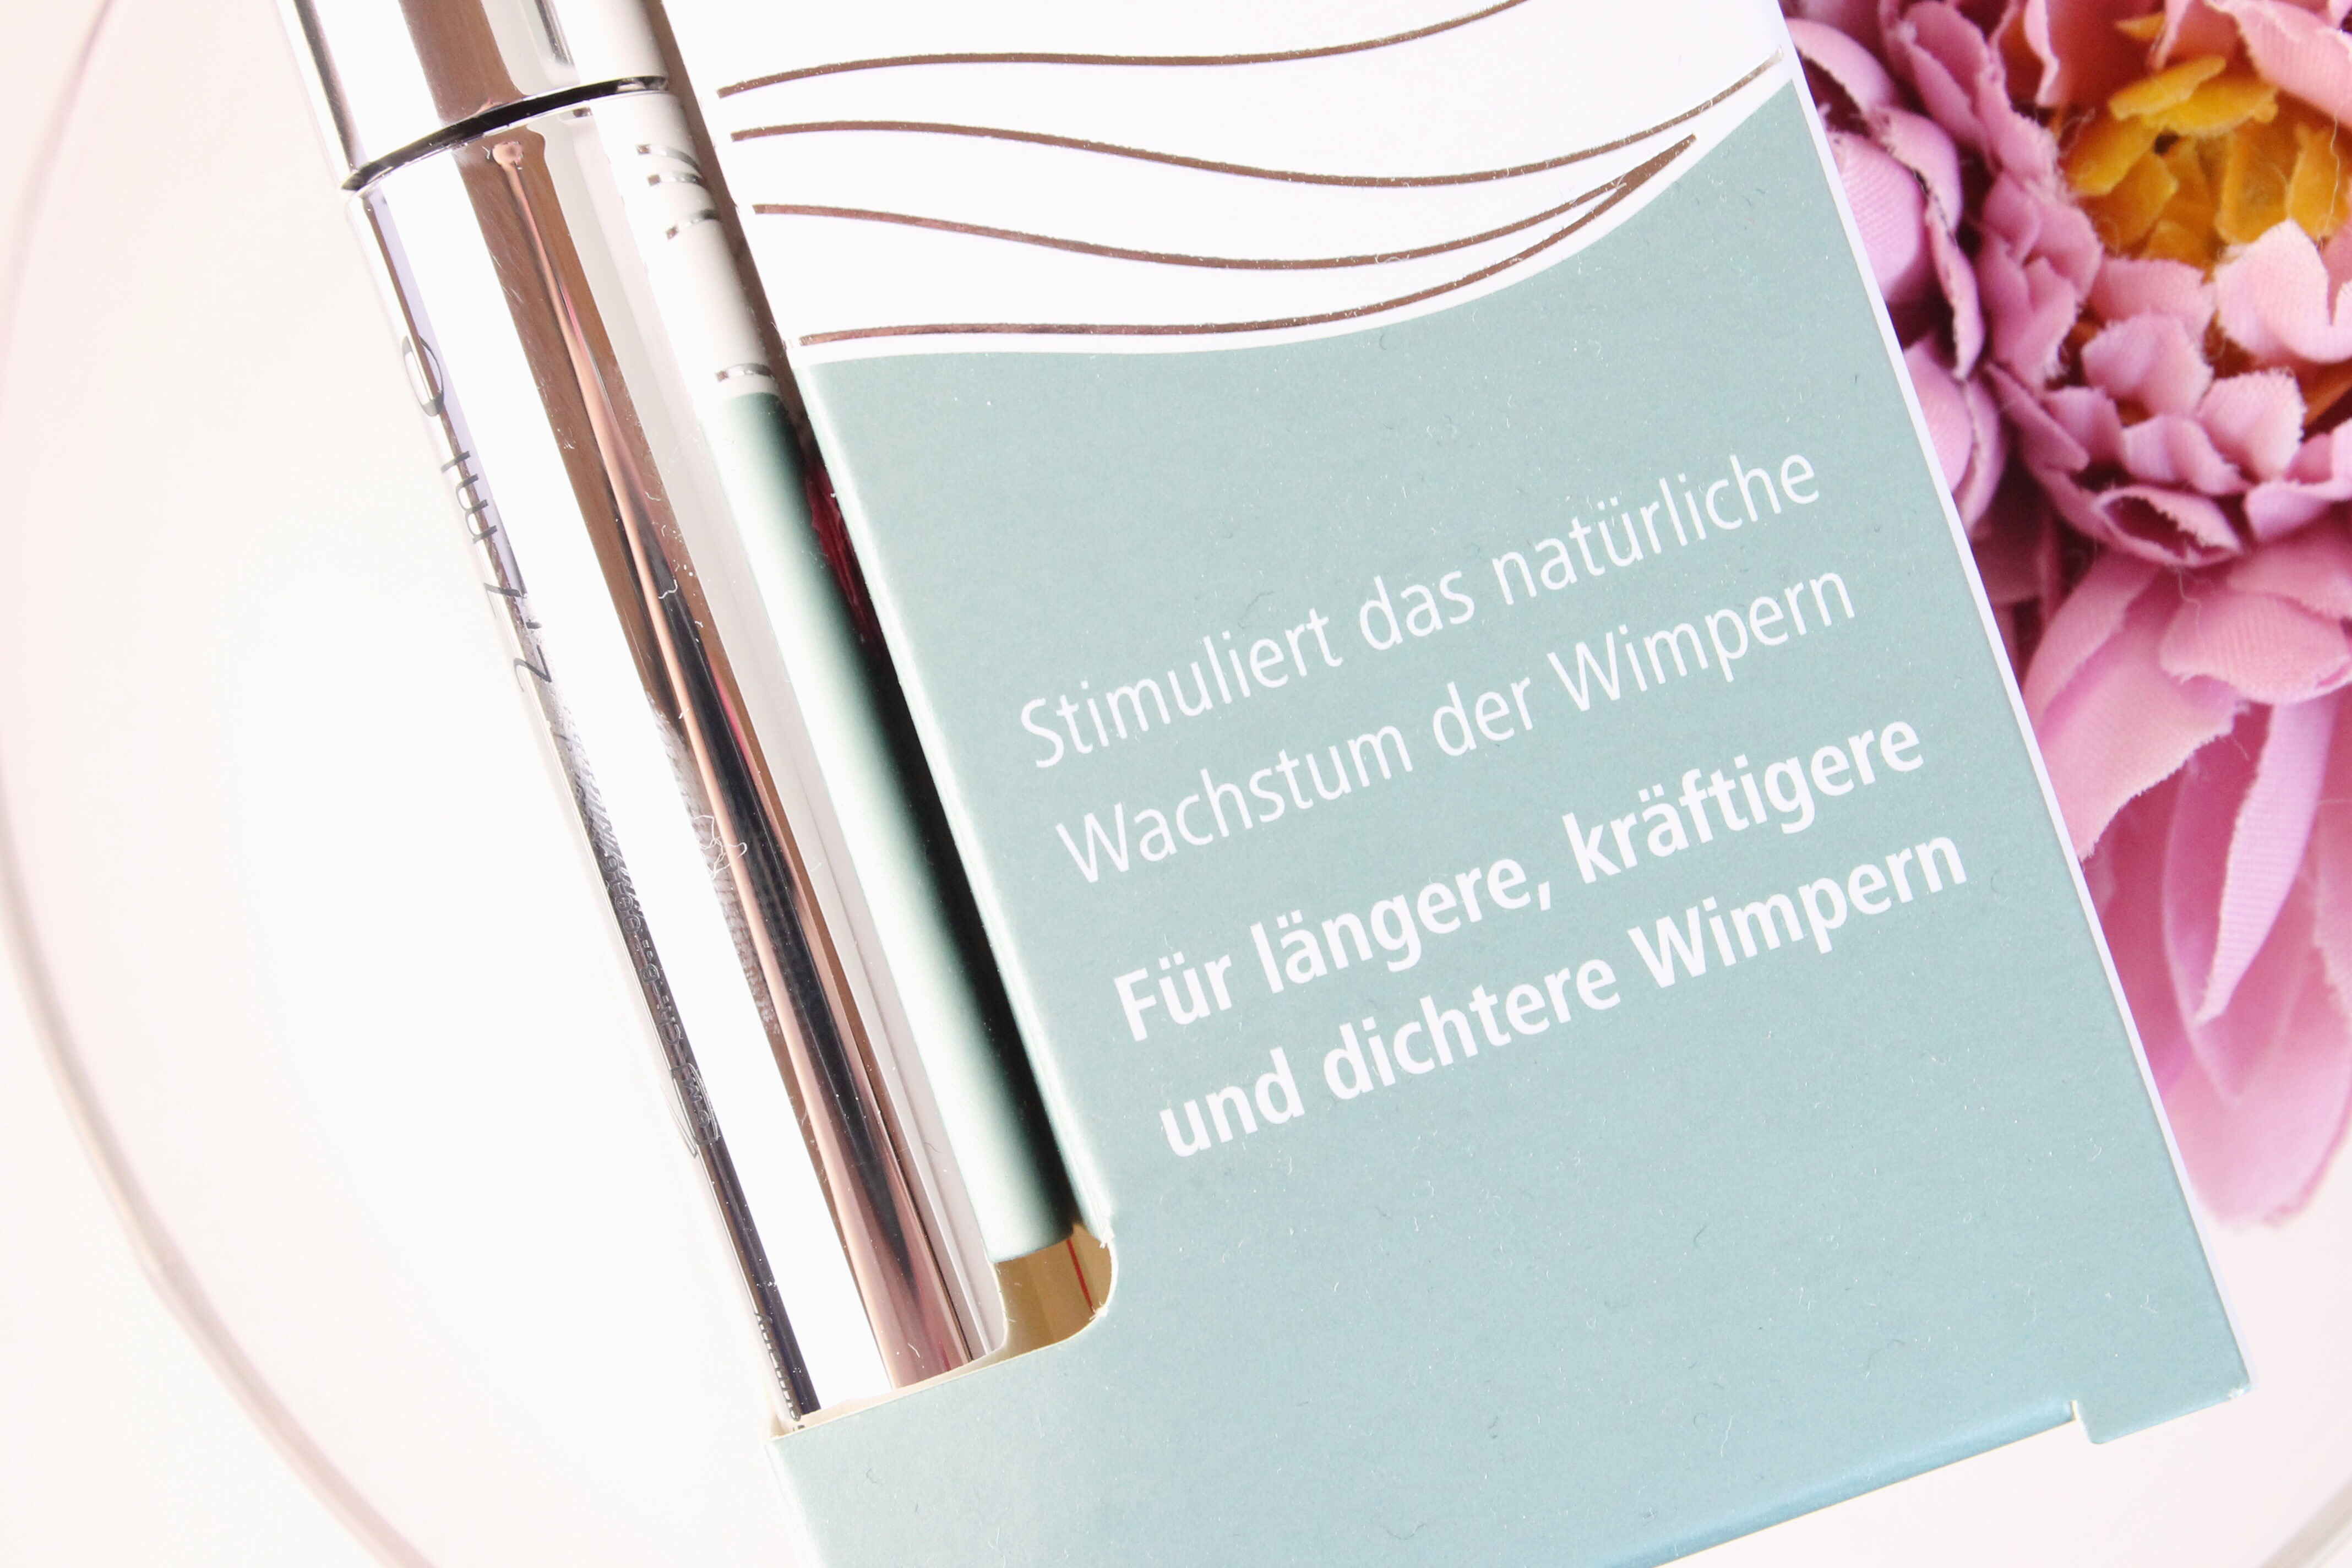 medipharma wimpern booster gewinnspiel monisrosawolke. Black Bedroom Furniture Sets. Home Design Ideas